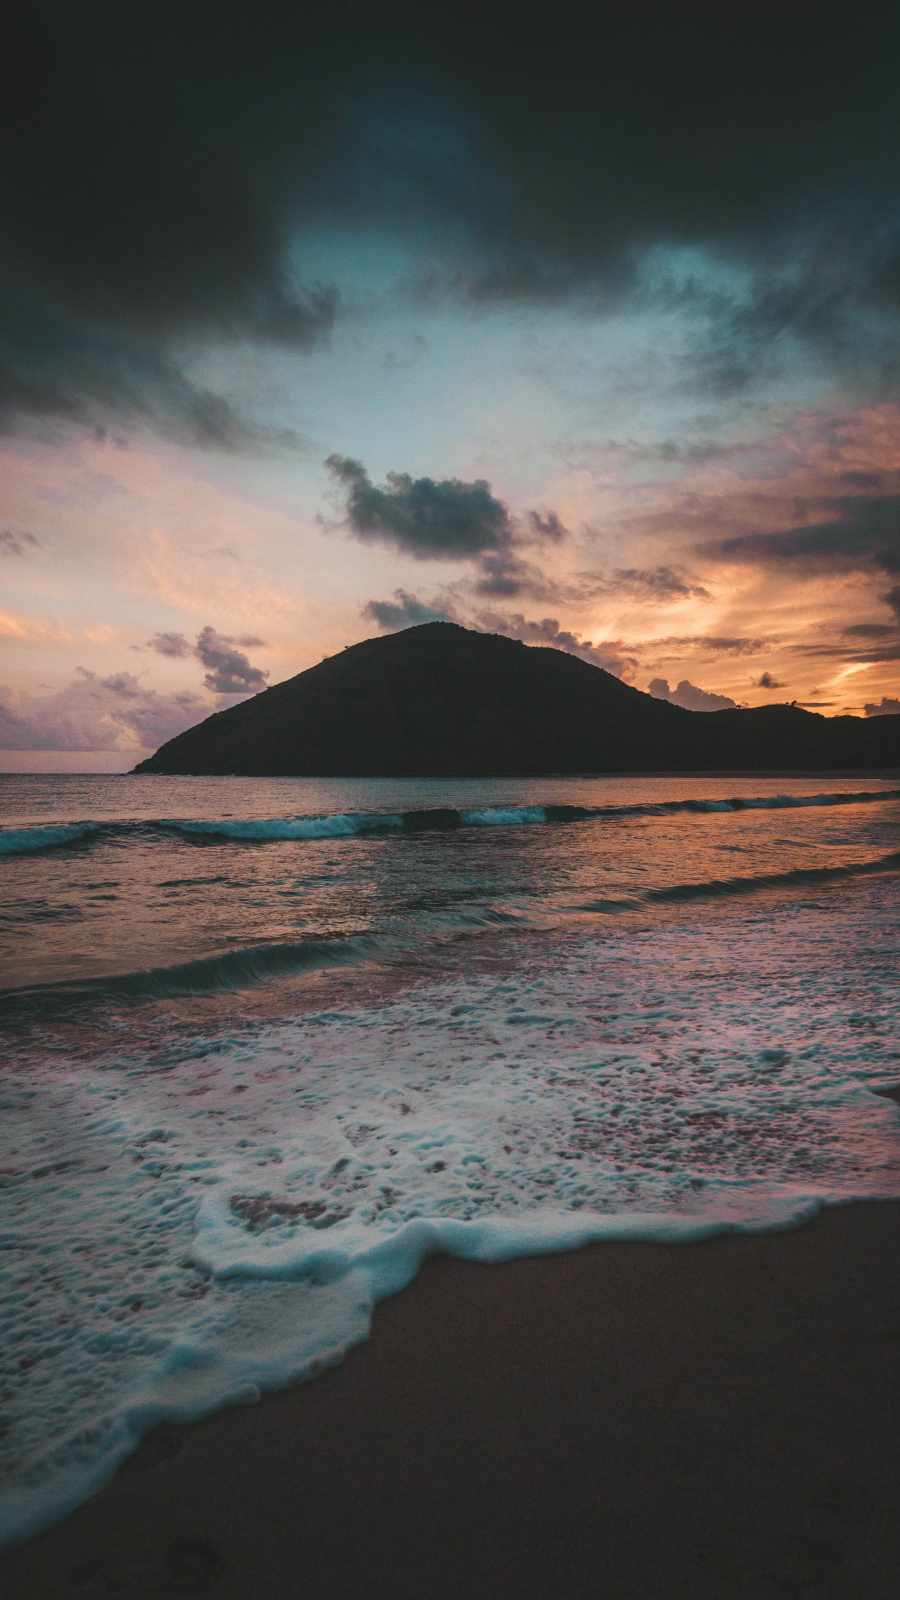 Beach Mountain iPhone Wallpaper